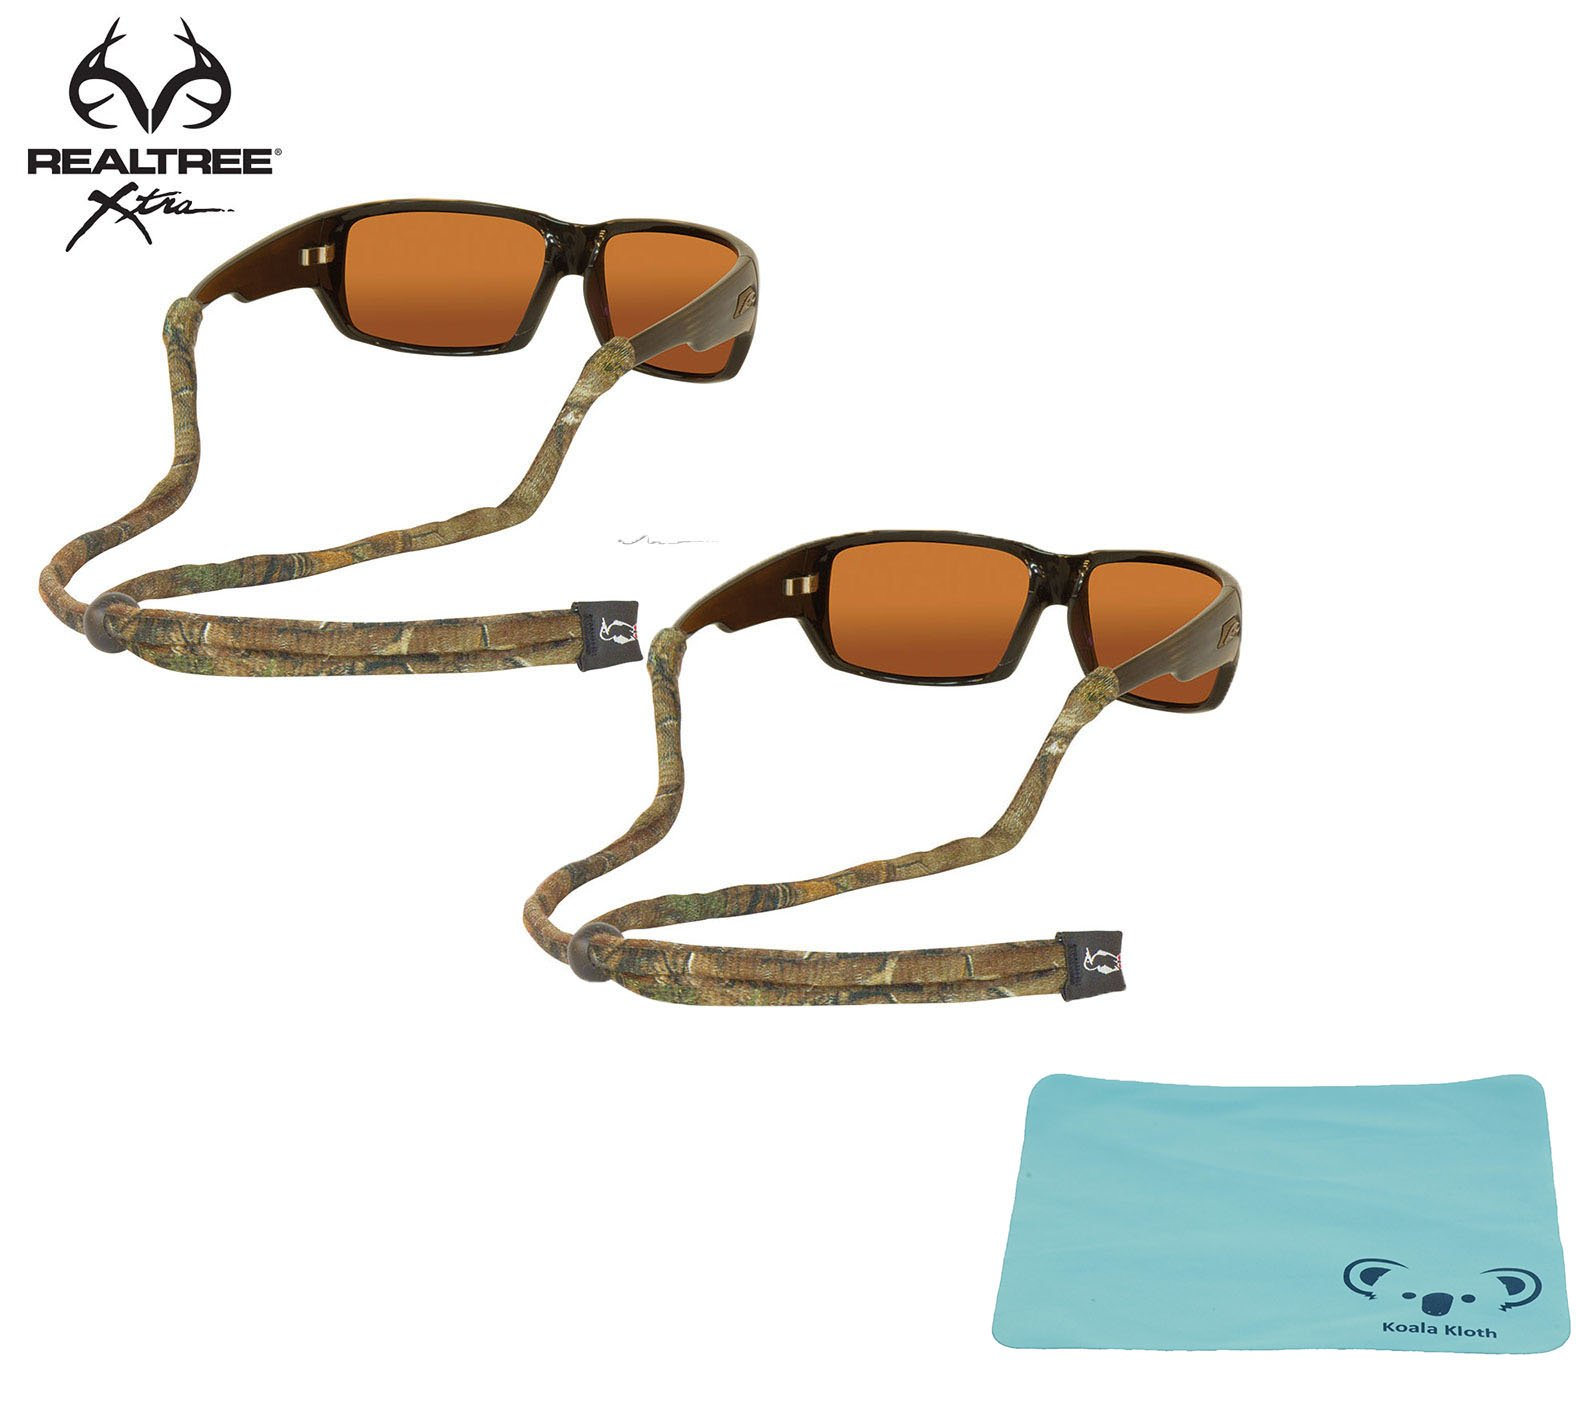 Chums Original Cotton Camoflauge Eyewear Retainer Sunglass Strap | Adjustable Eyeglass & Sports Glasses Holder Keeper Lanyard | 2pk Bundle + Cloth, Realtree Xtra